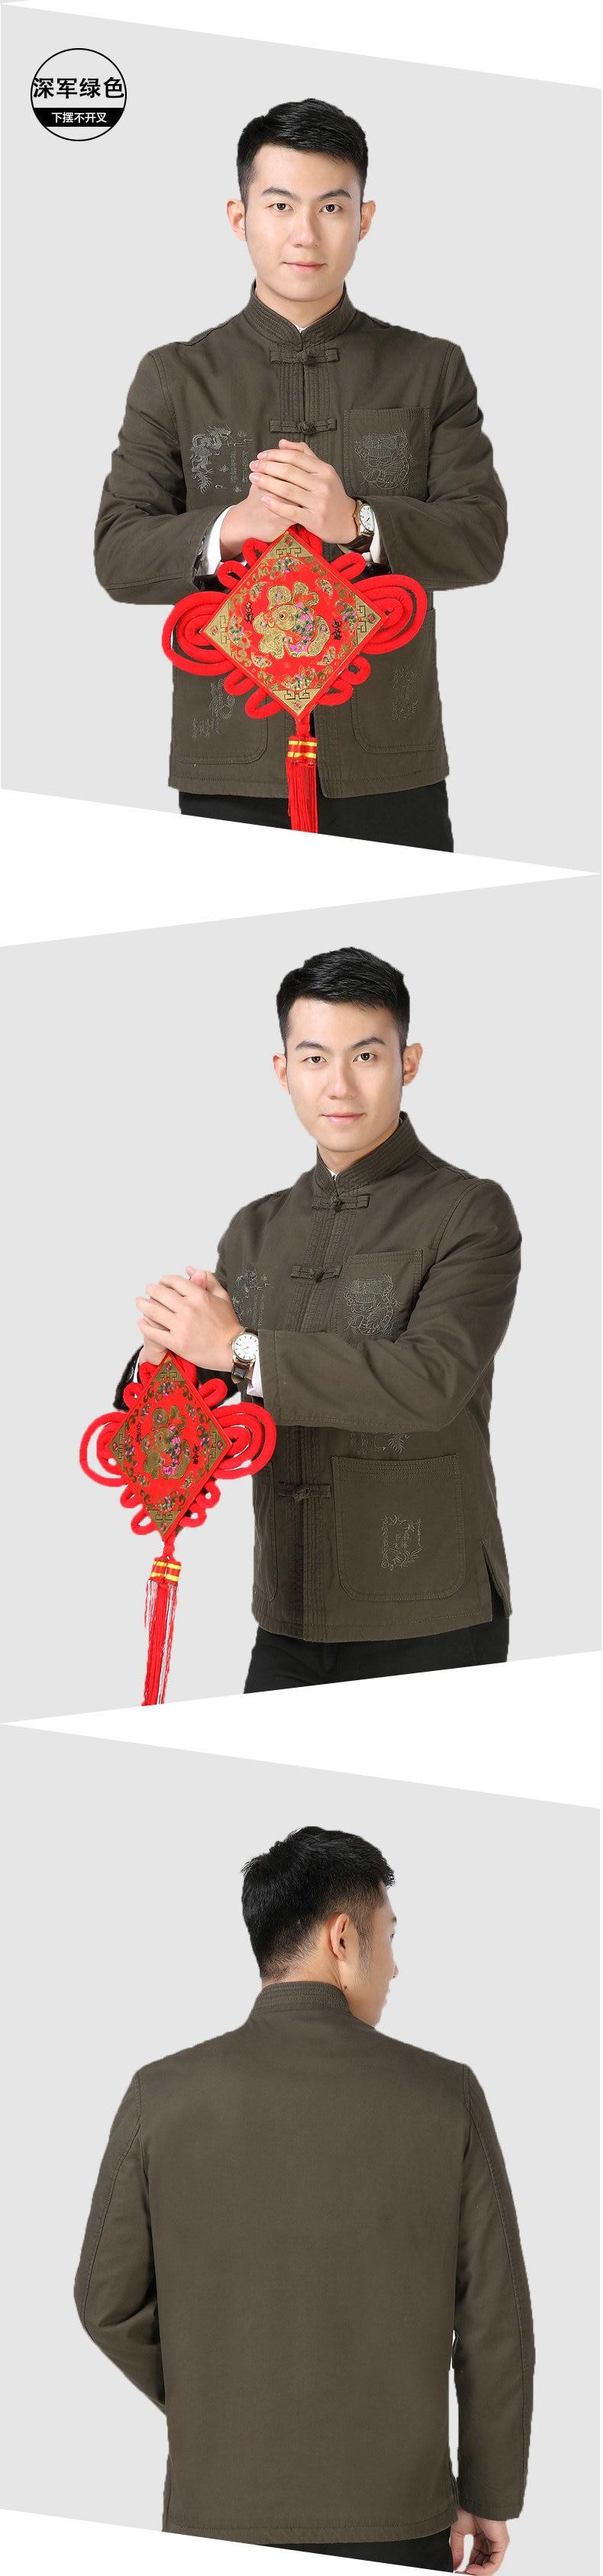 WAEOLSA Men Chinese Blazer Tunic Suit Coat Mandarin Collar Blazers Man Embroidery Tangzhuang Jacket Oriental Mao Suit Male Ethnical Blazer (5)